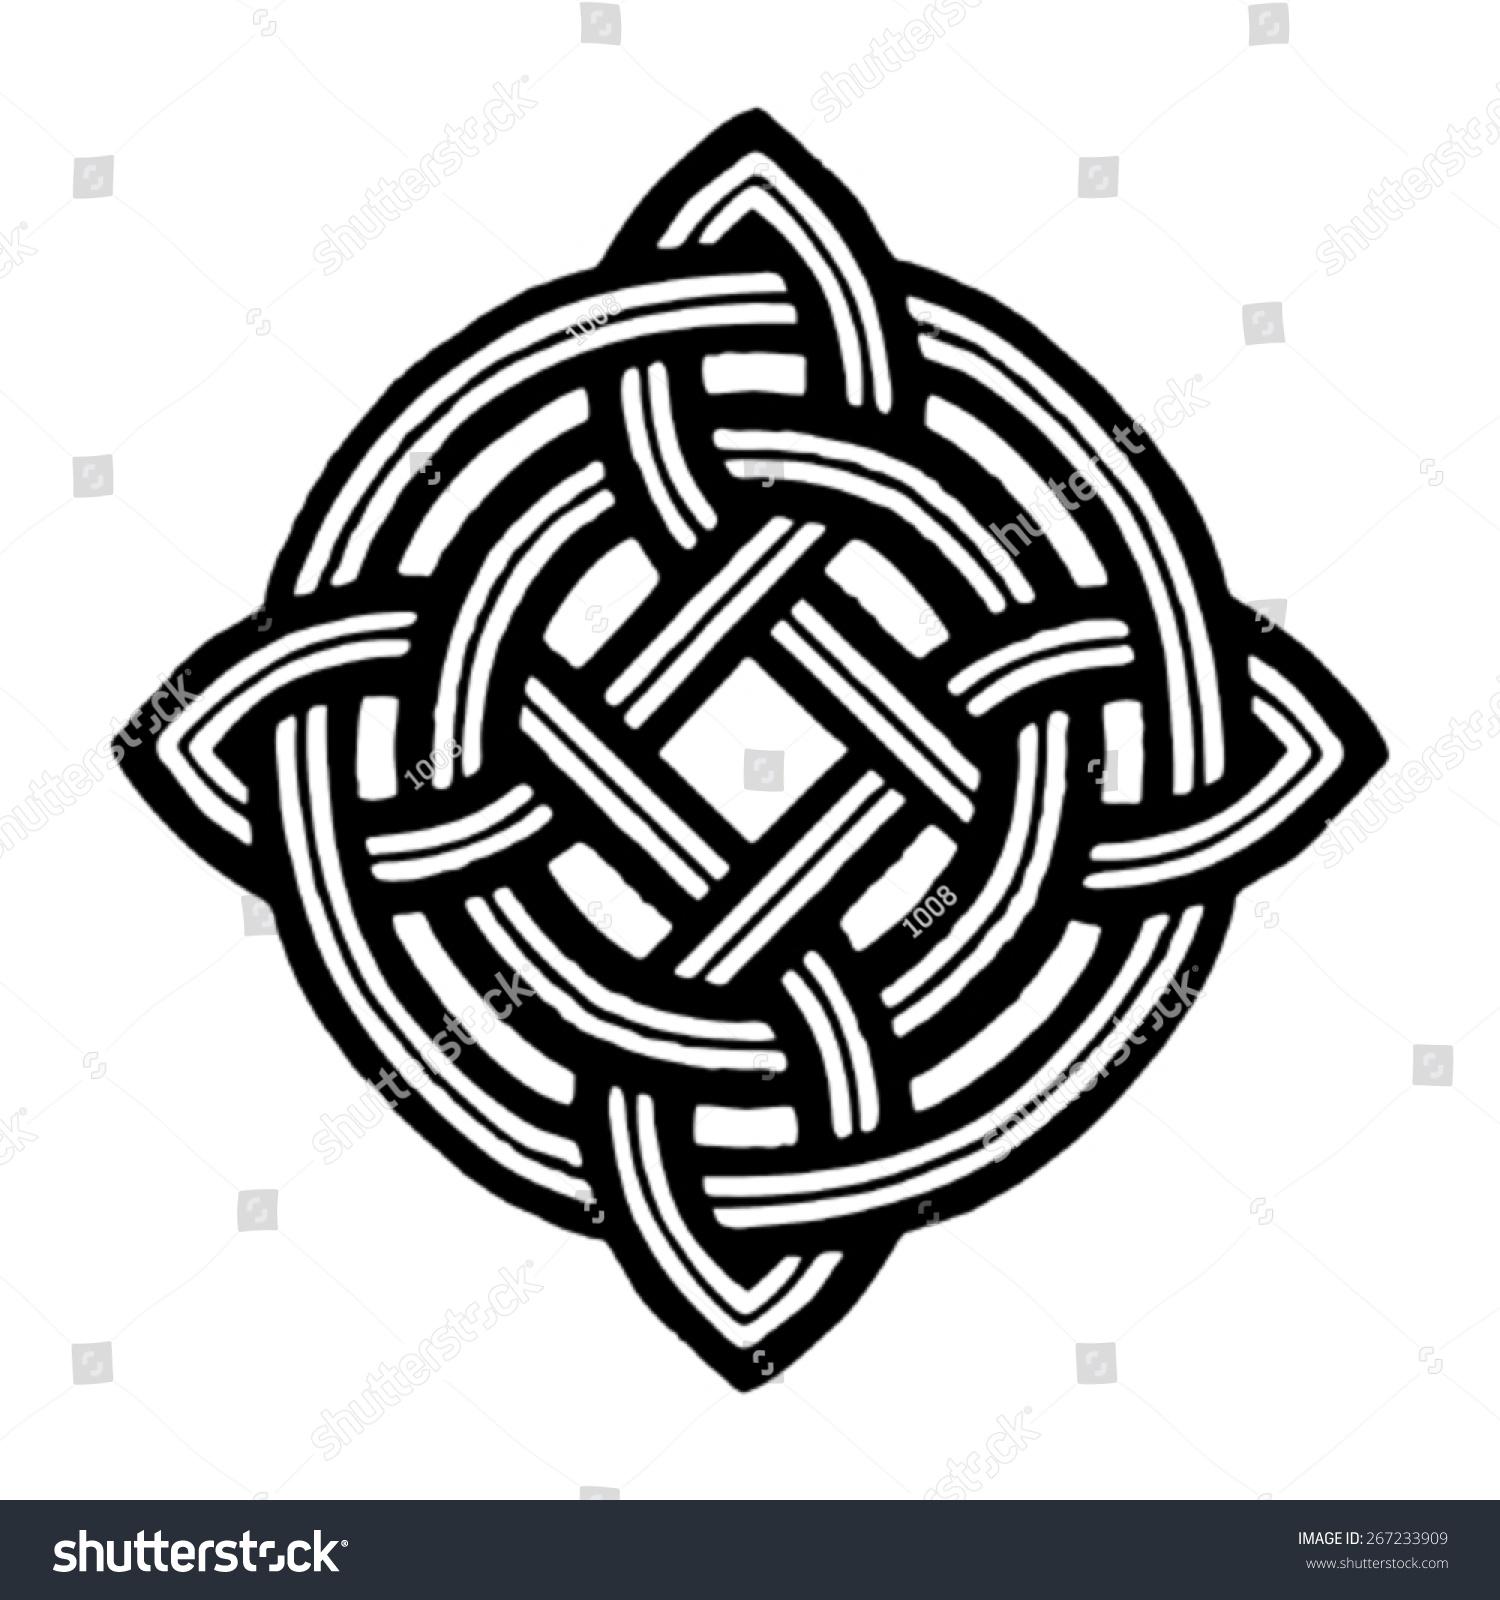 Medieval celtic viking tattoo symbol stock vector 267233909 medieval celtic viking tattoo symbol biocorpaavc Choice Image